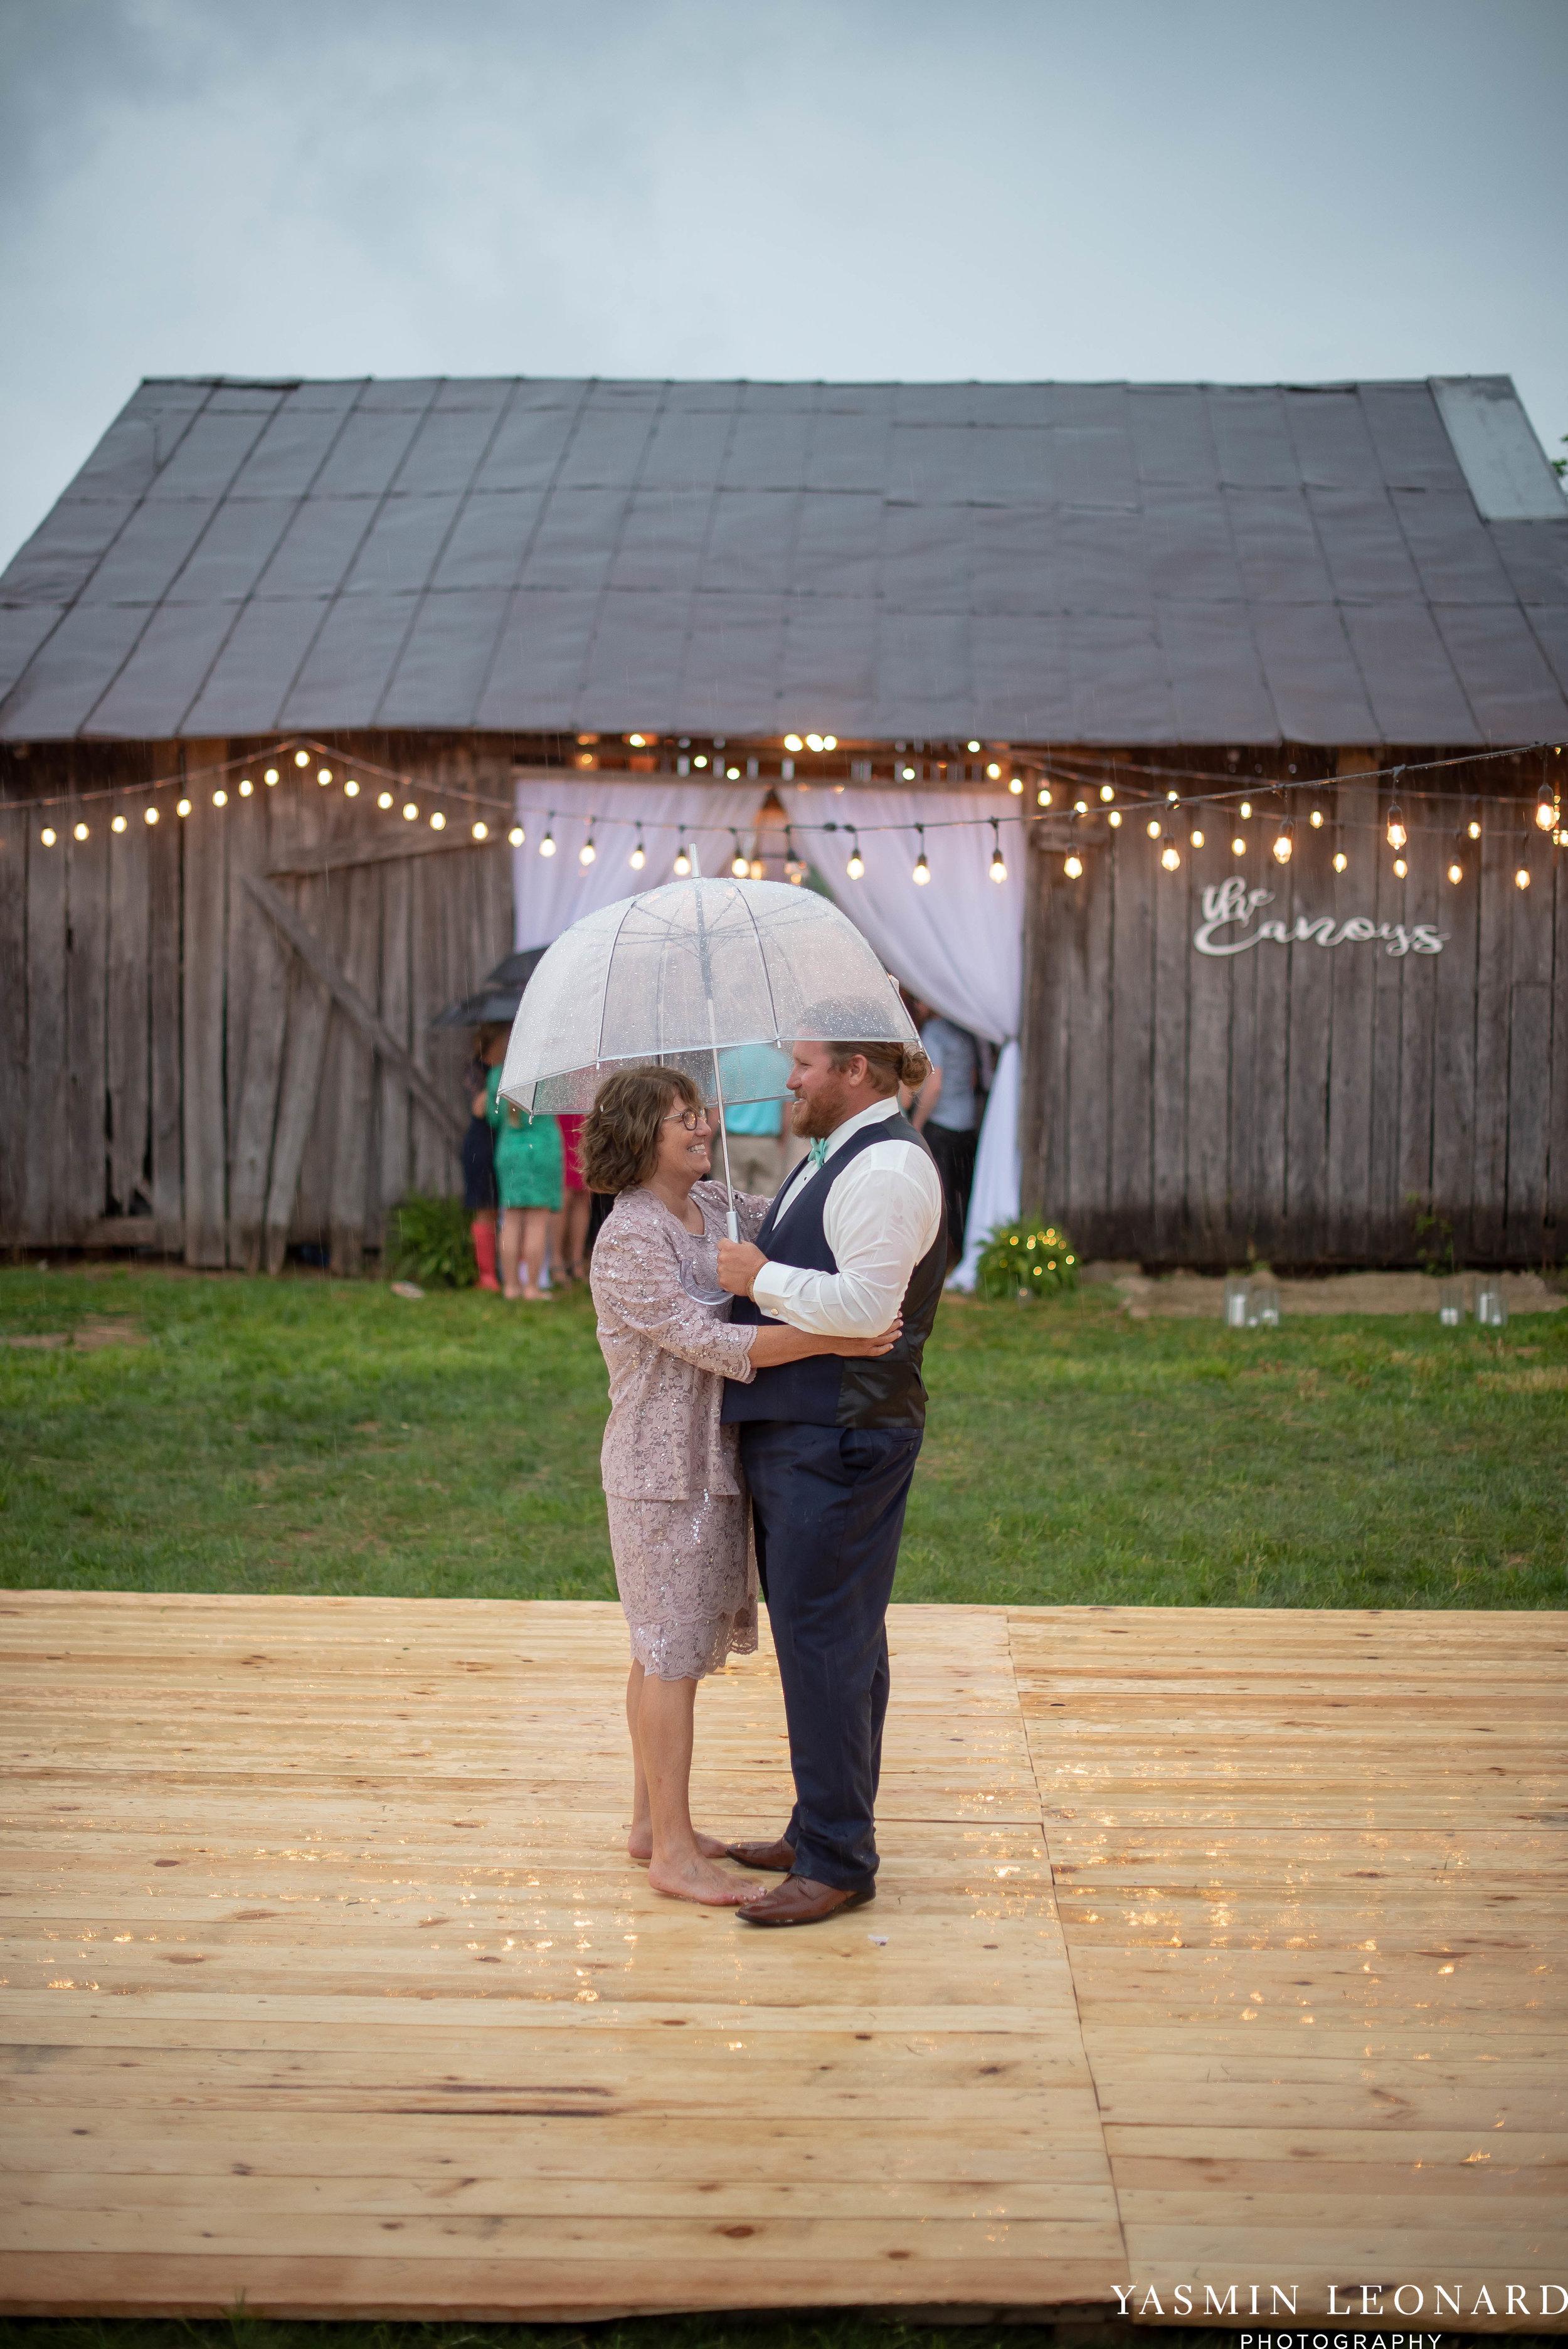 Rain on your wedding day - Rainy Wedding - Plan B for Rain - What to do if it rains on your wedding day - Wedding Inspiration - Outdoor wedding ideas - Rainy Wedding Pictures - Yasmin Leonard Photography-76.jpg